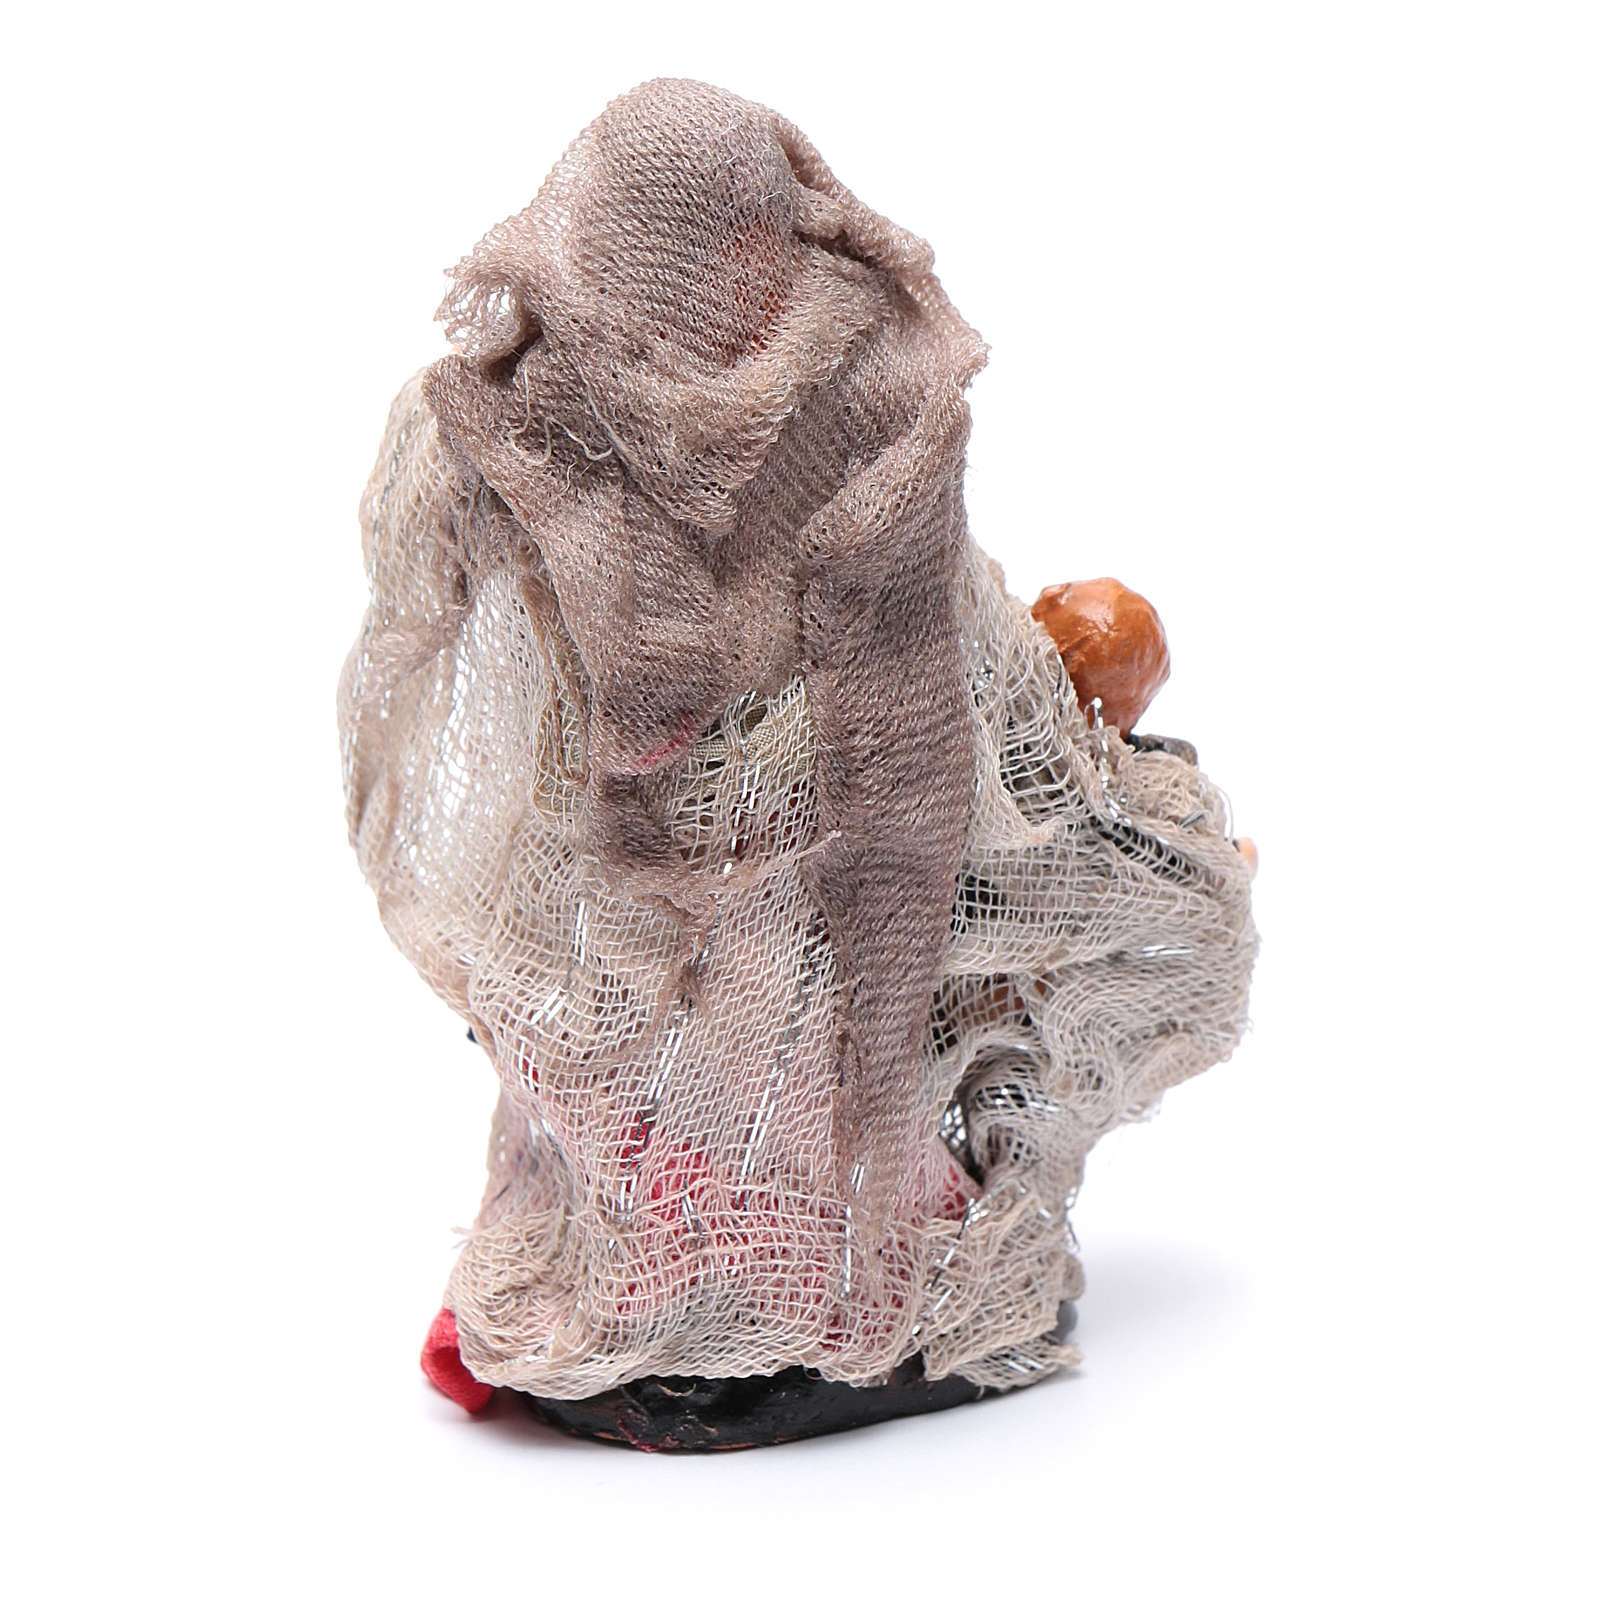 Donna con bimbo in mano 8 cm presepe Napoli 4